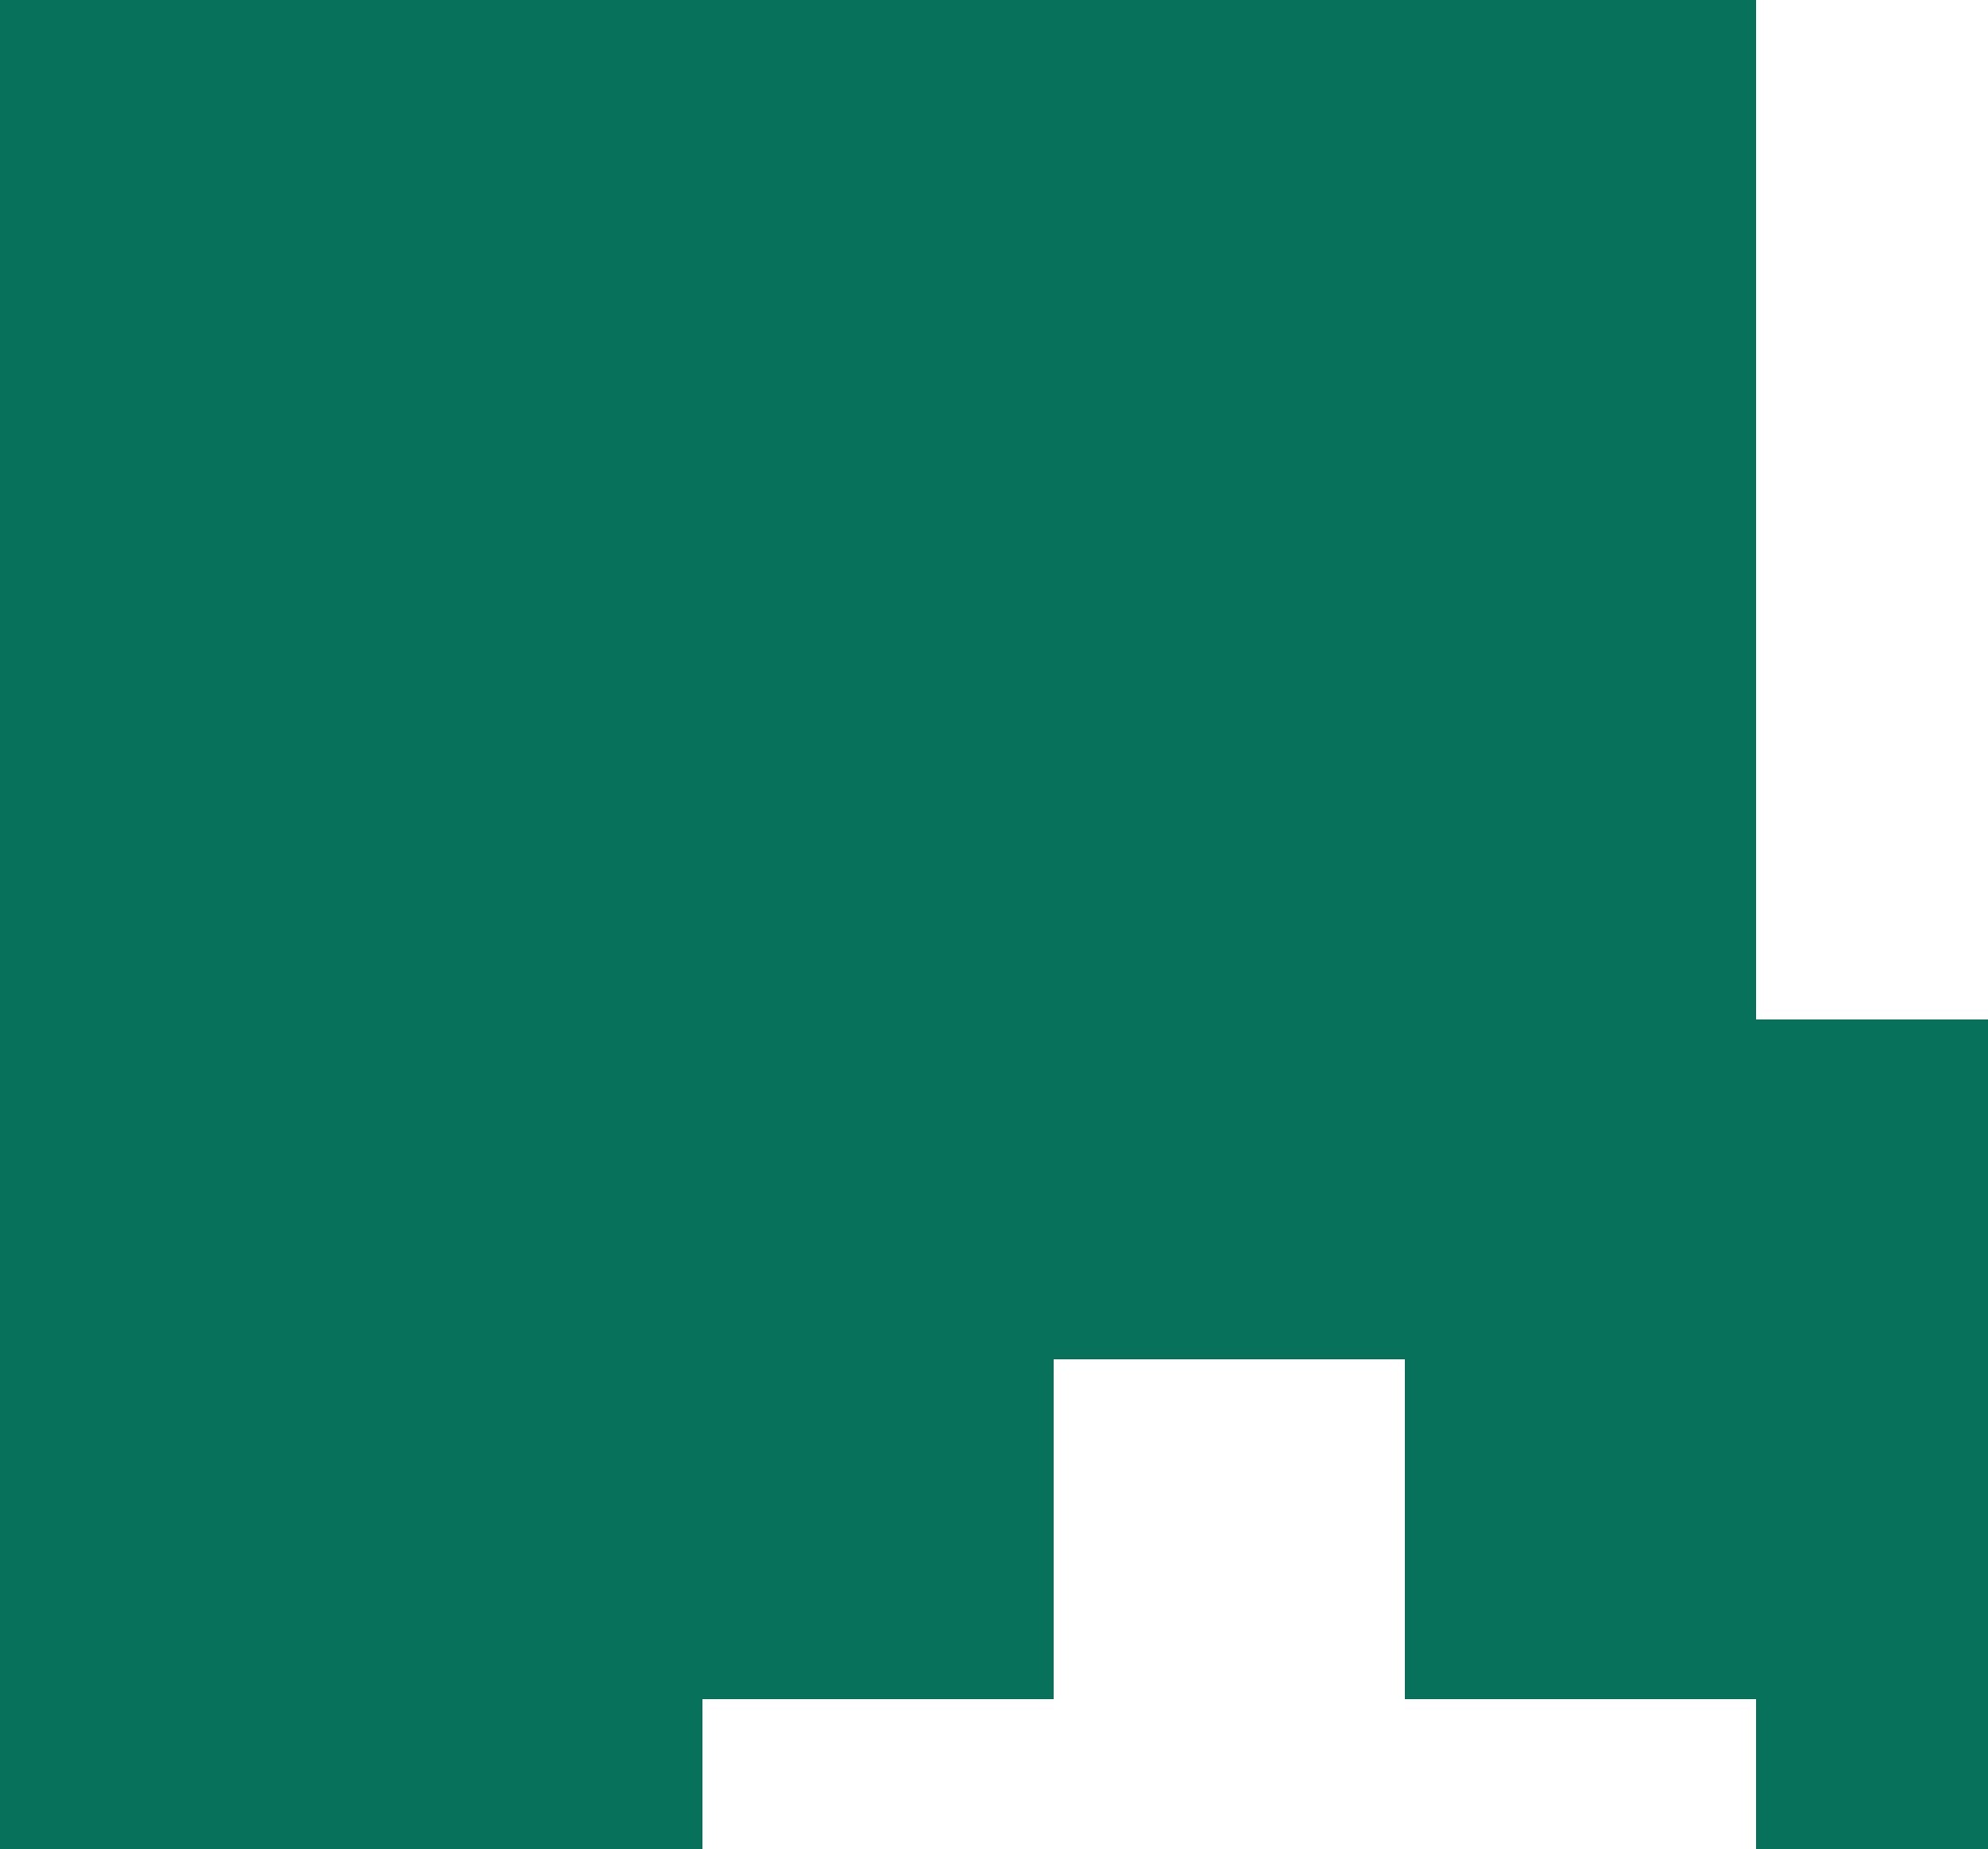 Pine green Alaska Icon